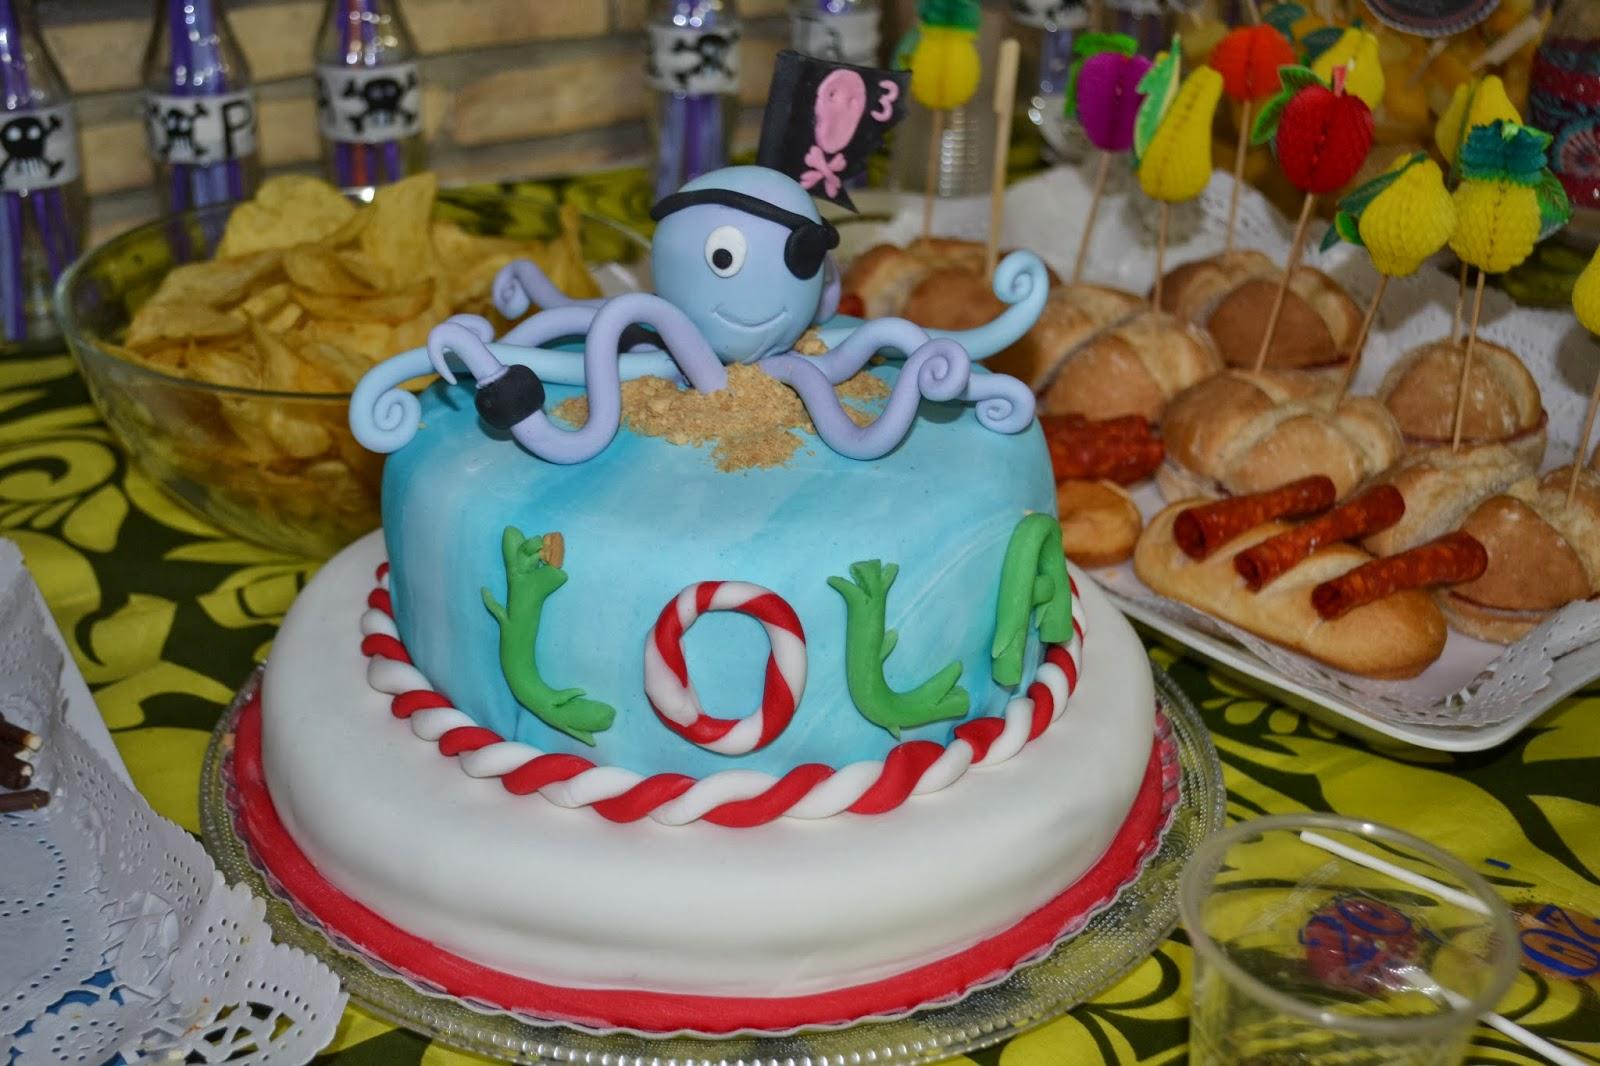 Pasteleria creativa con acento ruso tarta pirata lola - El piso de lola ...